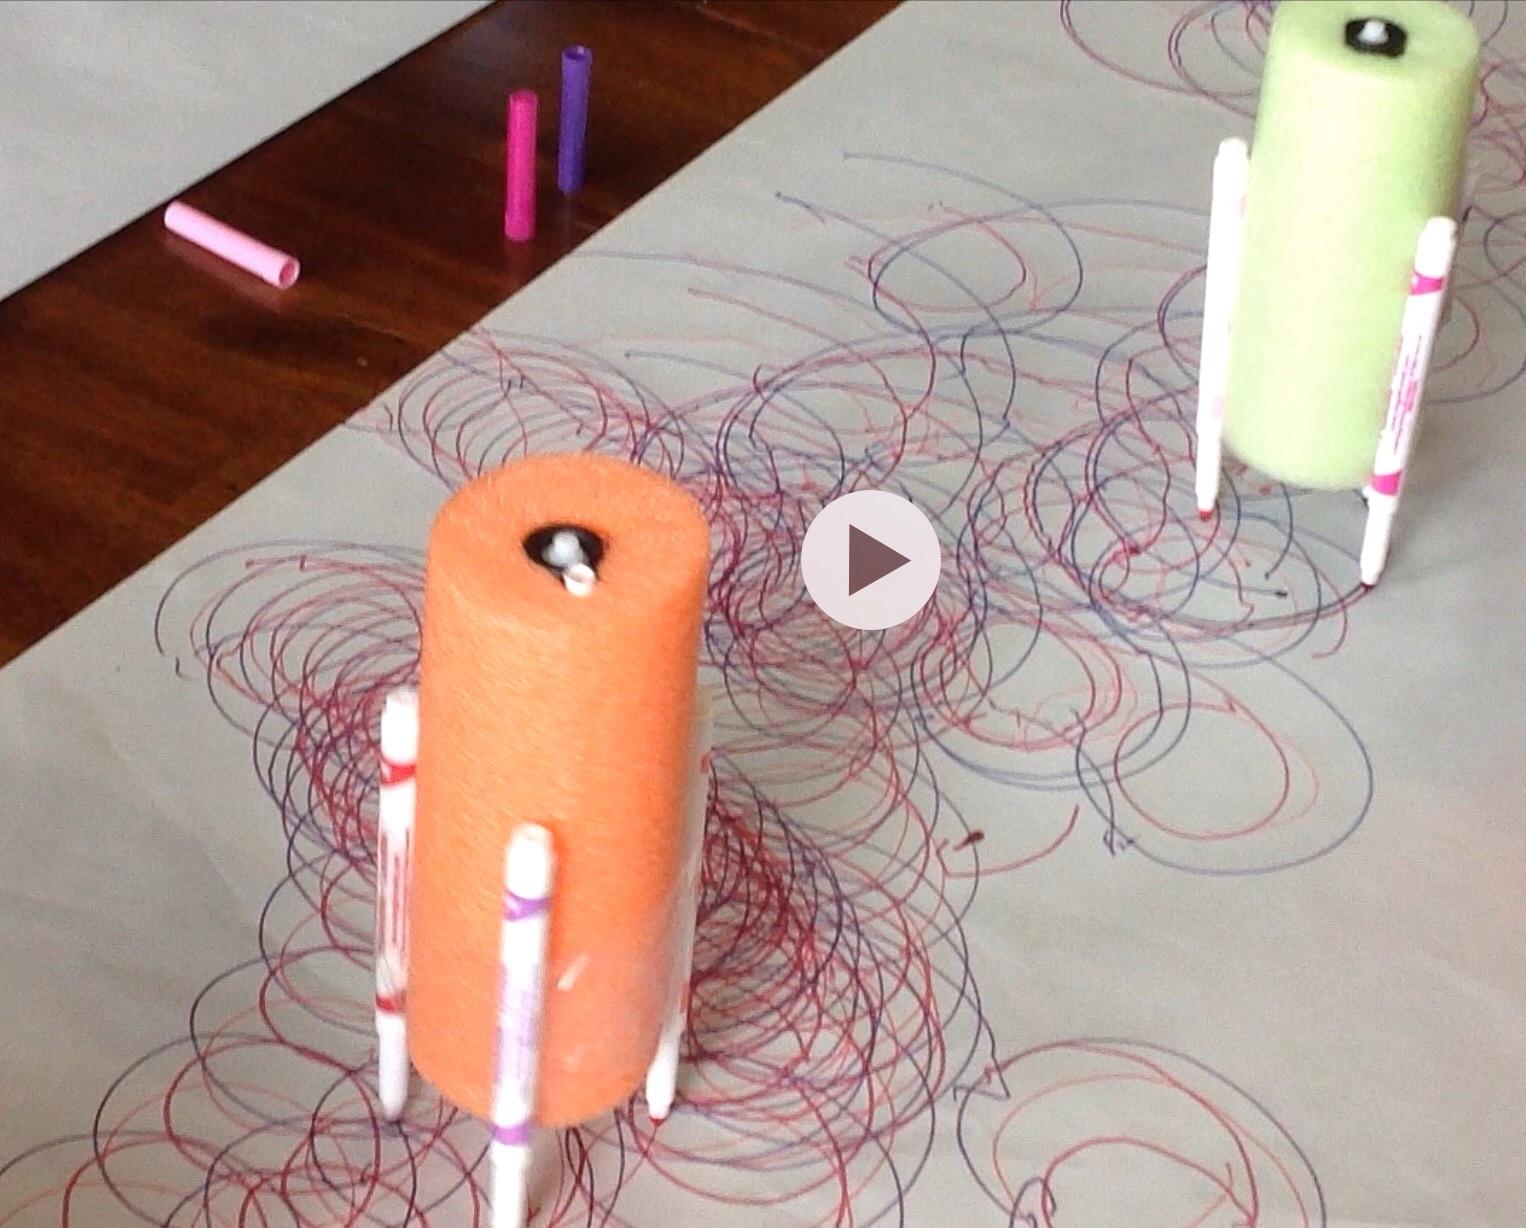 DIY Art Robot – fun activity for the kids